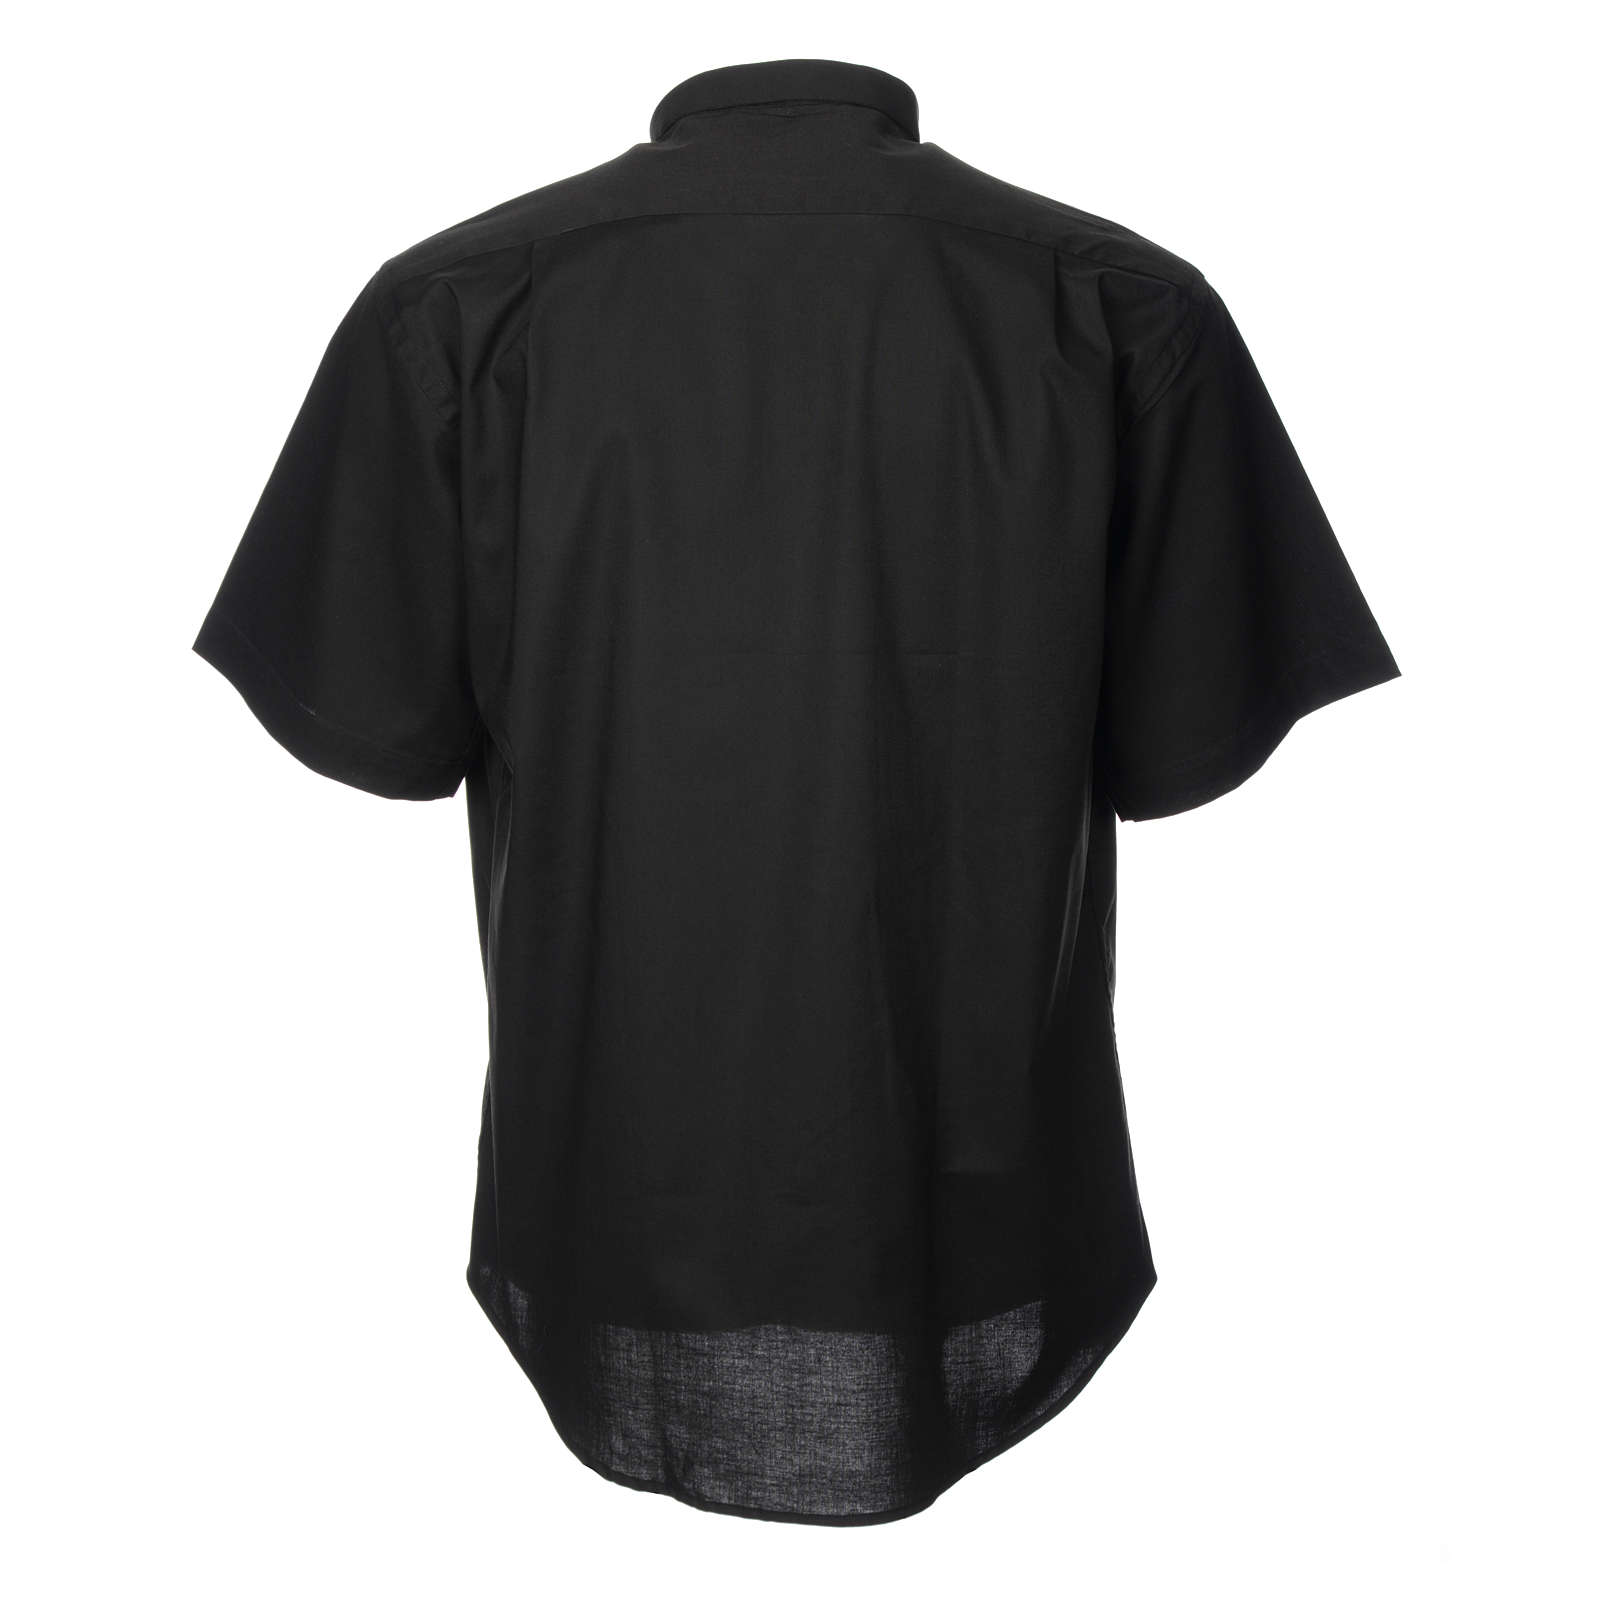 STOCK Camisa manga corta mezcla algodón negra 4